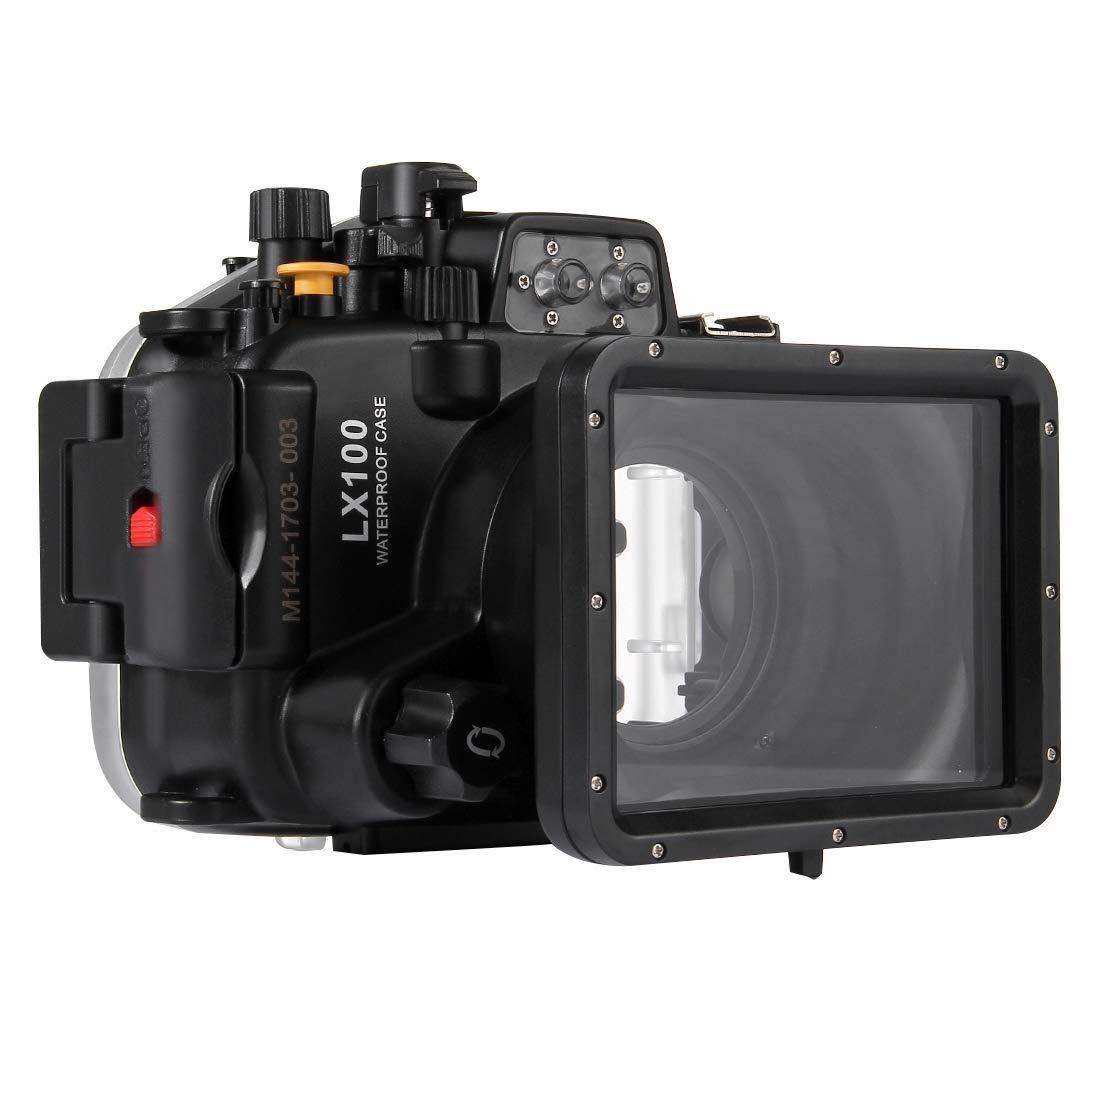 PULUZ 40mパナソニックLUMIX DMC-LX100用水中深度ダイビングケース防水カメラハウジング   B07QQRRLDF